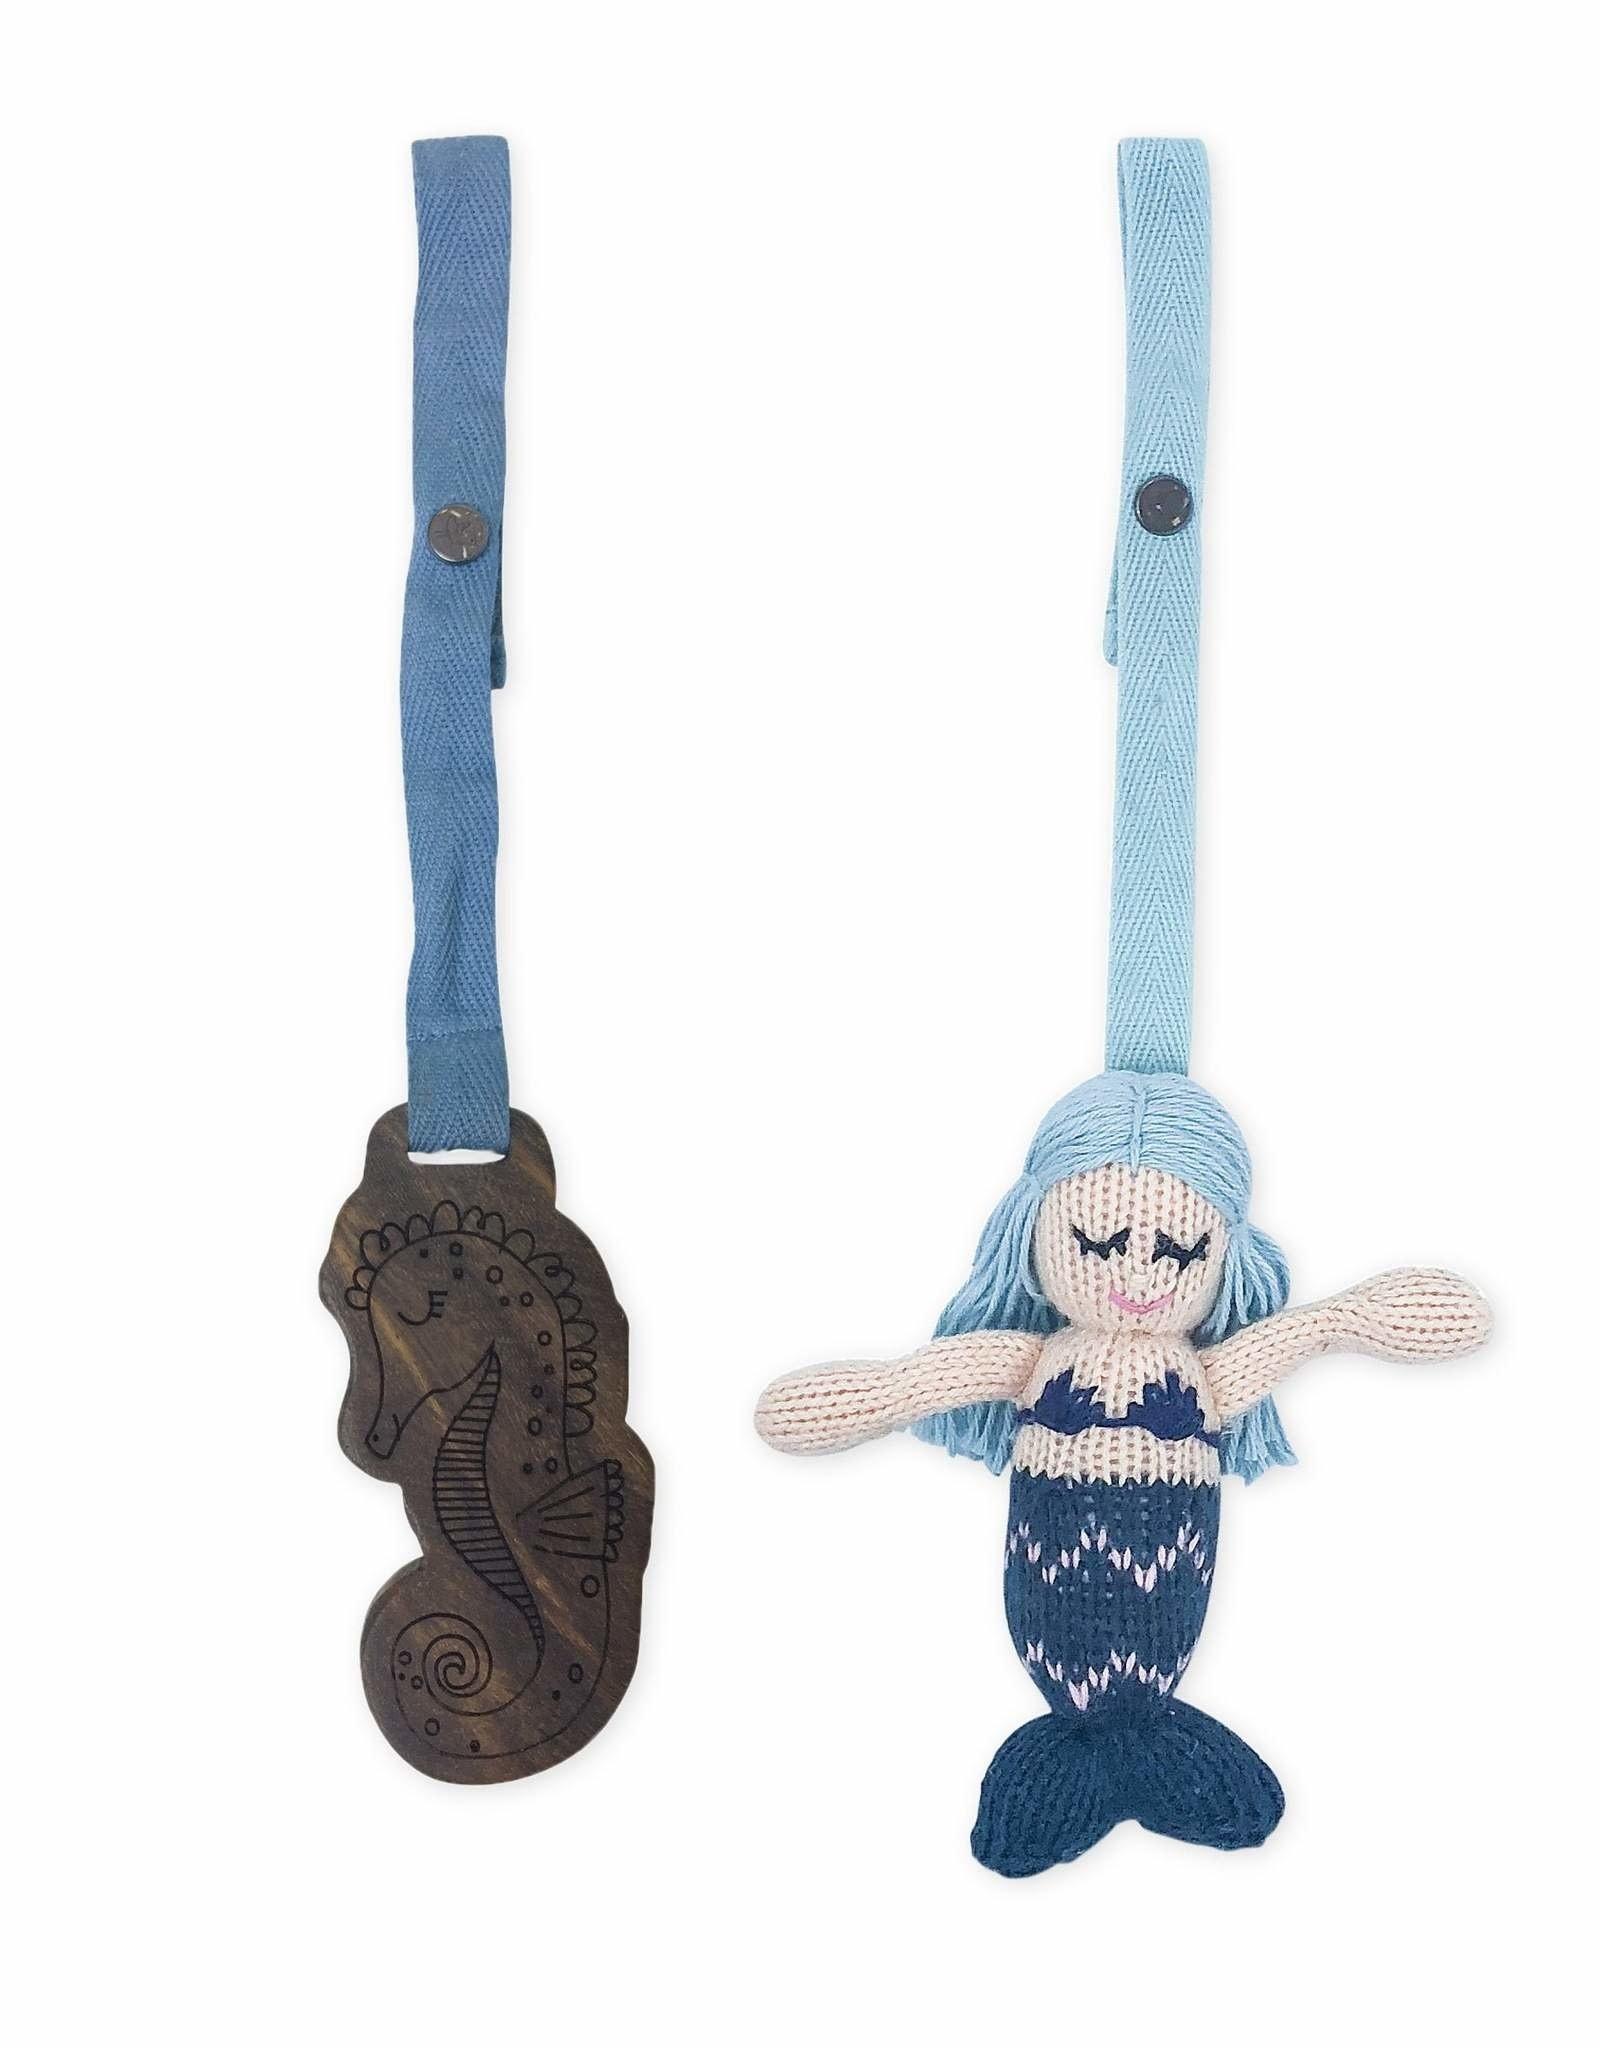 Finn + Emma Stroller Toys, 2 Piece Set Penelope (mermaid) + Seahorse